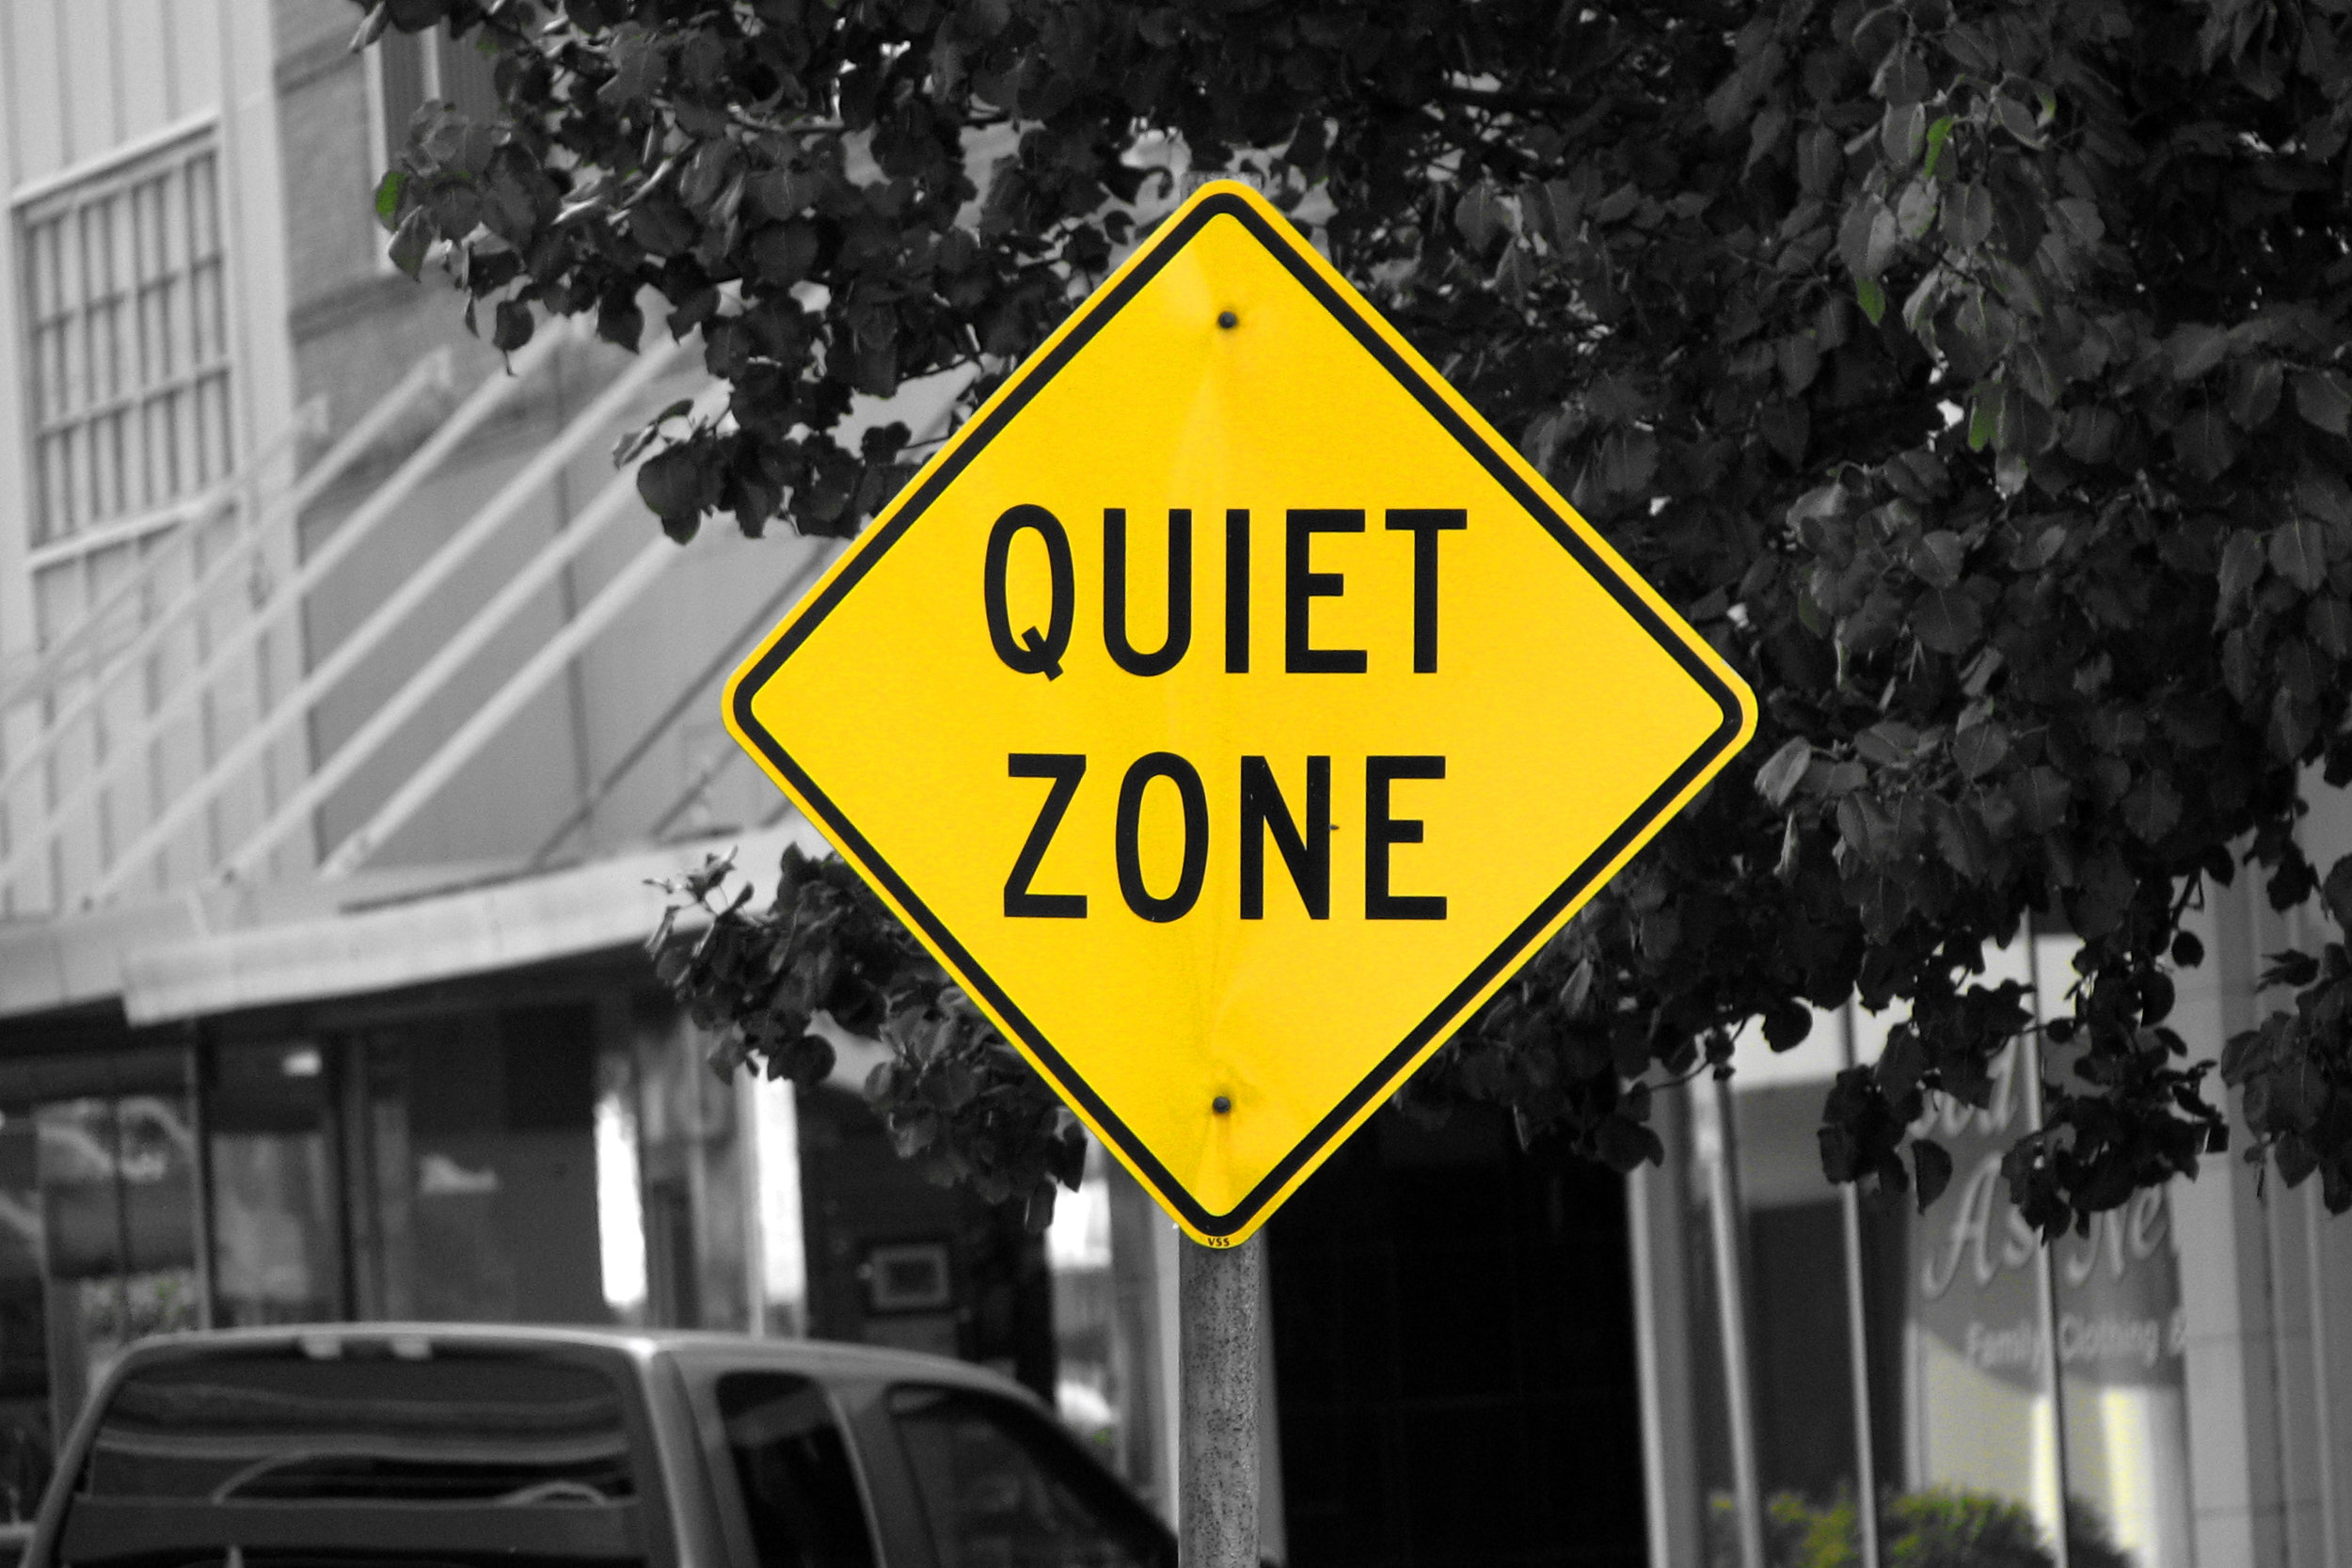 https://upload.wikimedia.org/wikipedia/commons/7/7f/Quiet_Zone_4889090049.jpg